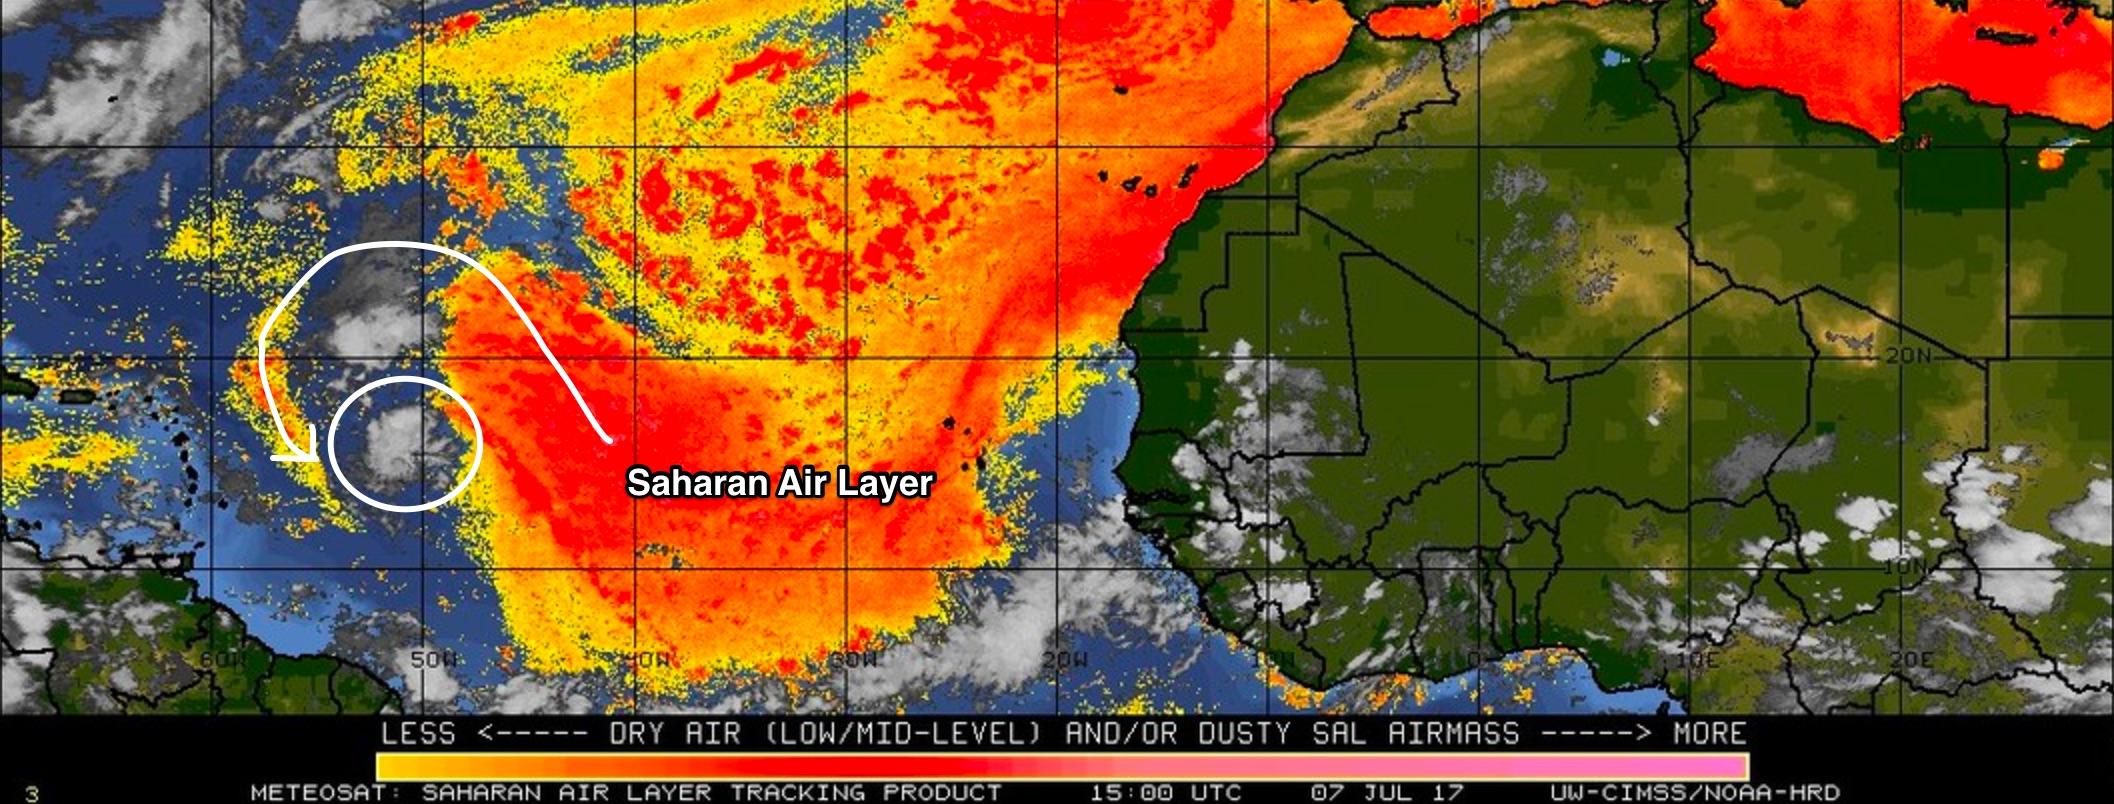 Saharan_Air_Layer__SAL__-_Split_Window_-_MET-9_-_Latest_Available.jpg